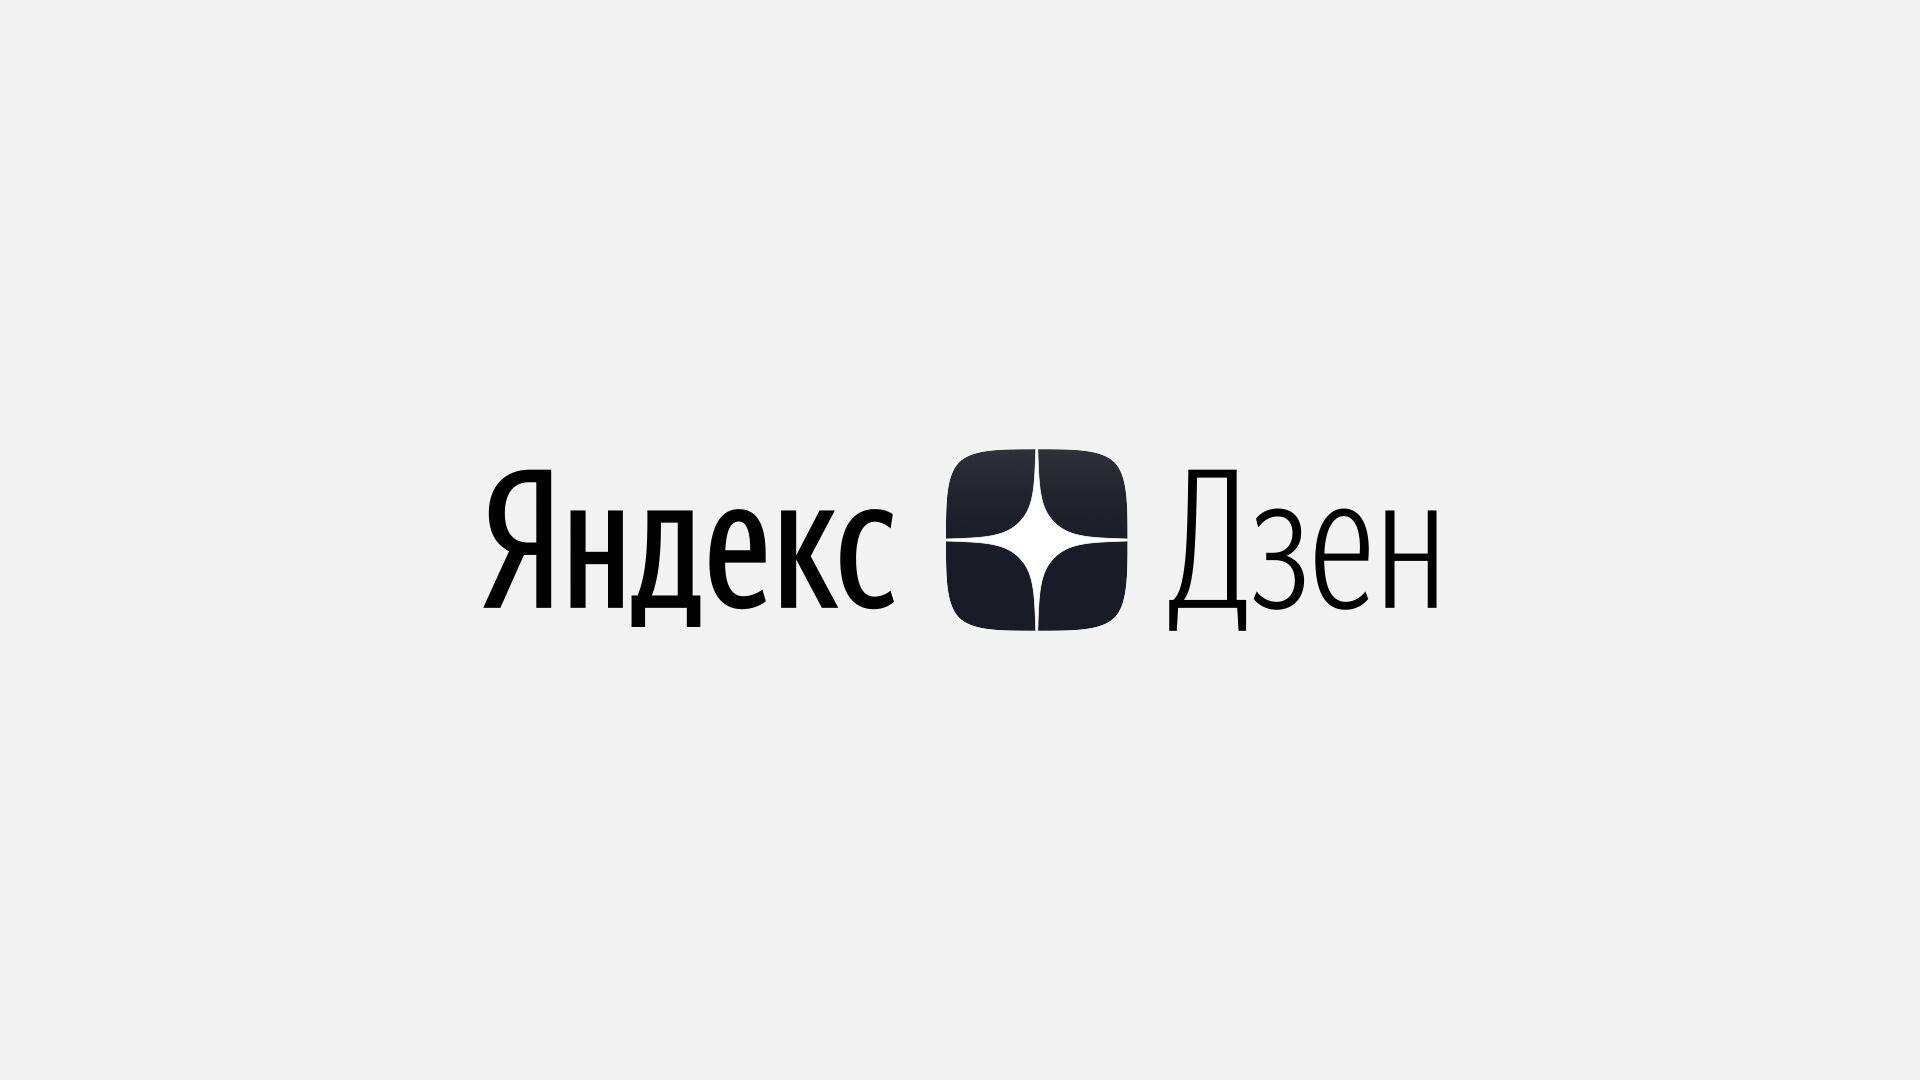 https://www.cossa.ru/upload/medialibrary/3c6/ya_2.jpeg